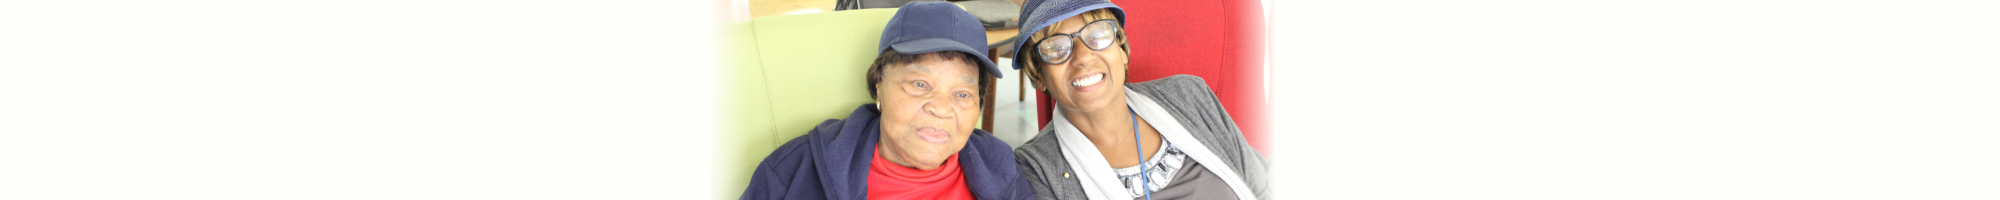 elderly woman and lady wearing eyeglasses smiling